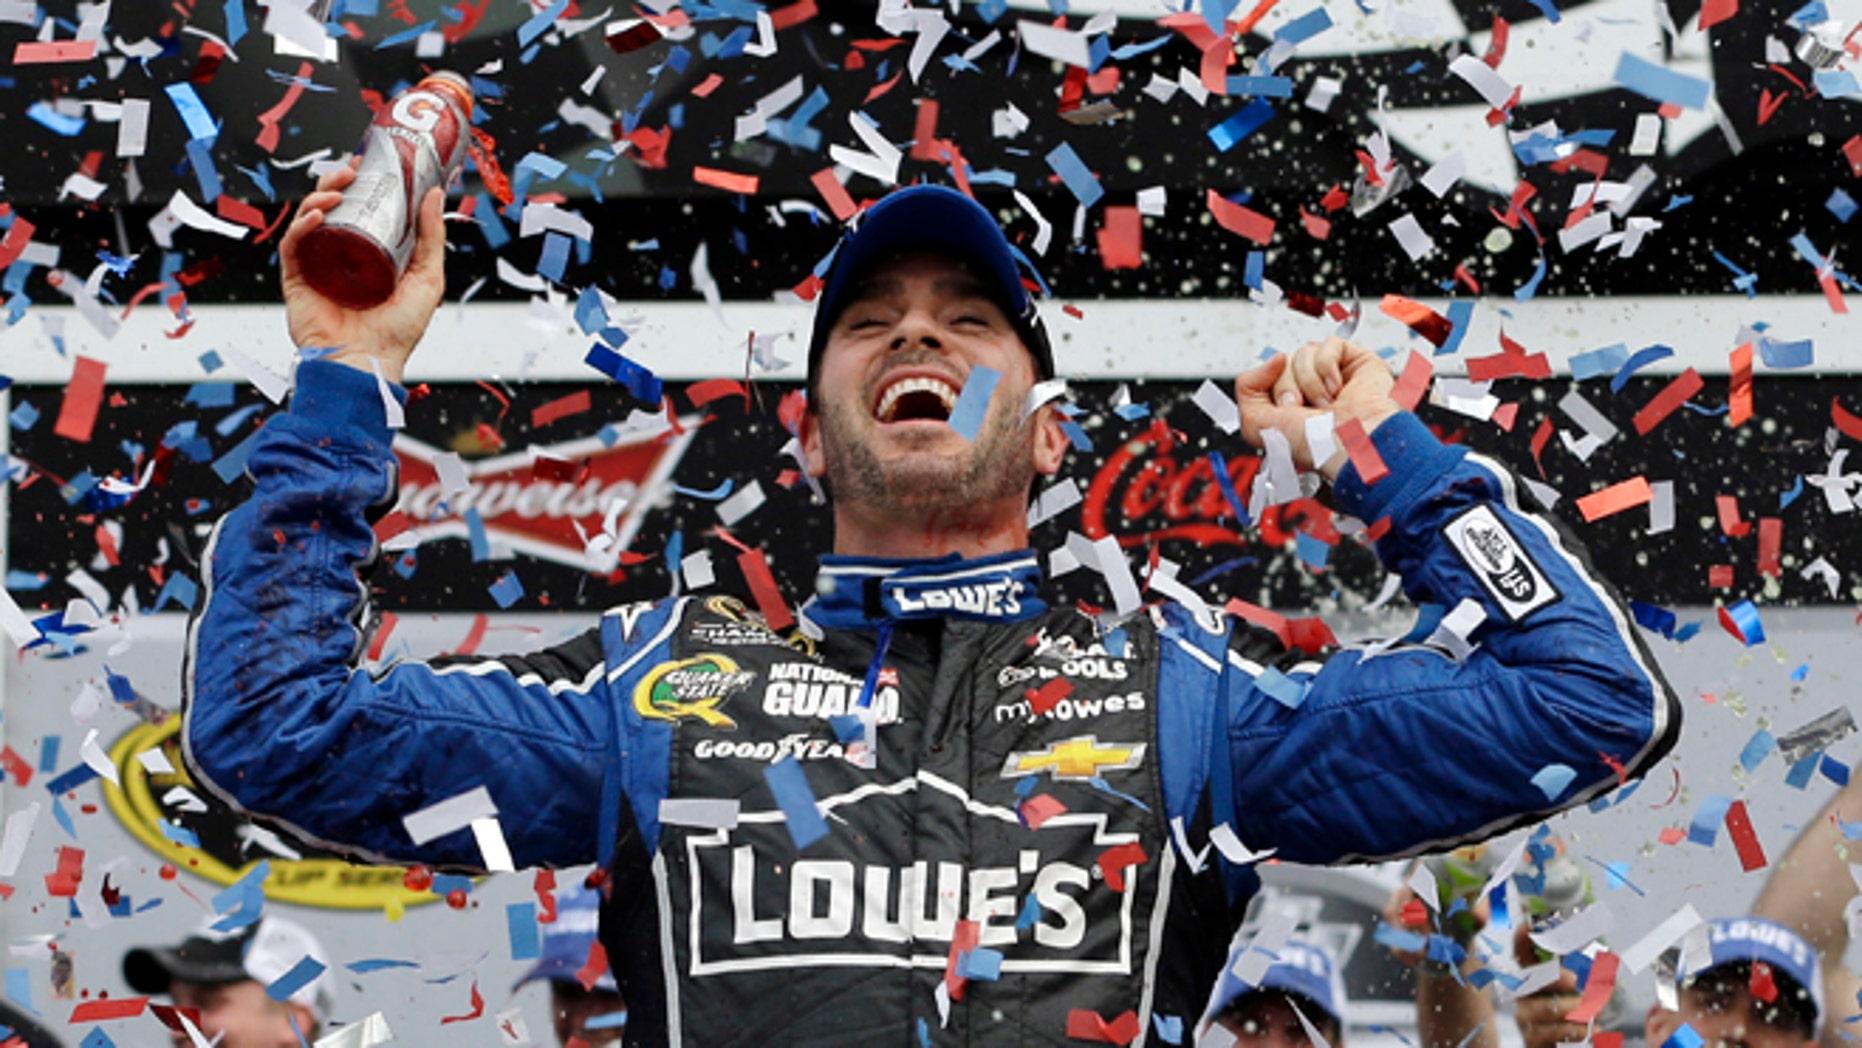 Feb. 24, 2013: Jimmie Johnson celebrates in Victory Lane after winning the NASCAR Daytona 500 Sprint Cup Series auto race at Daytona International Speedway in Daytona Beach, Fla.